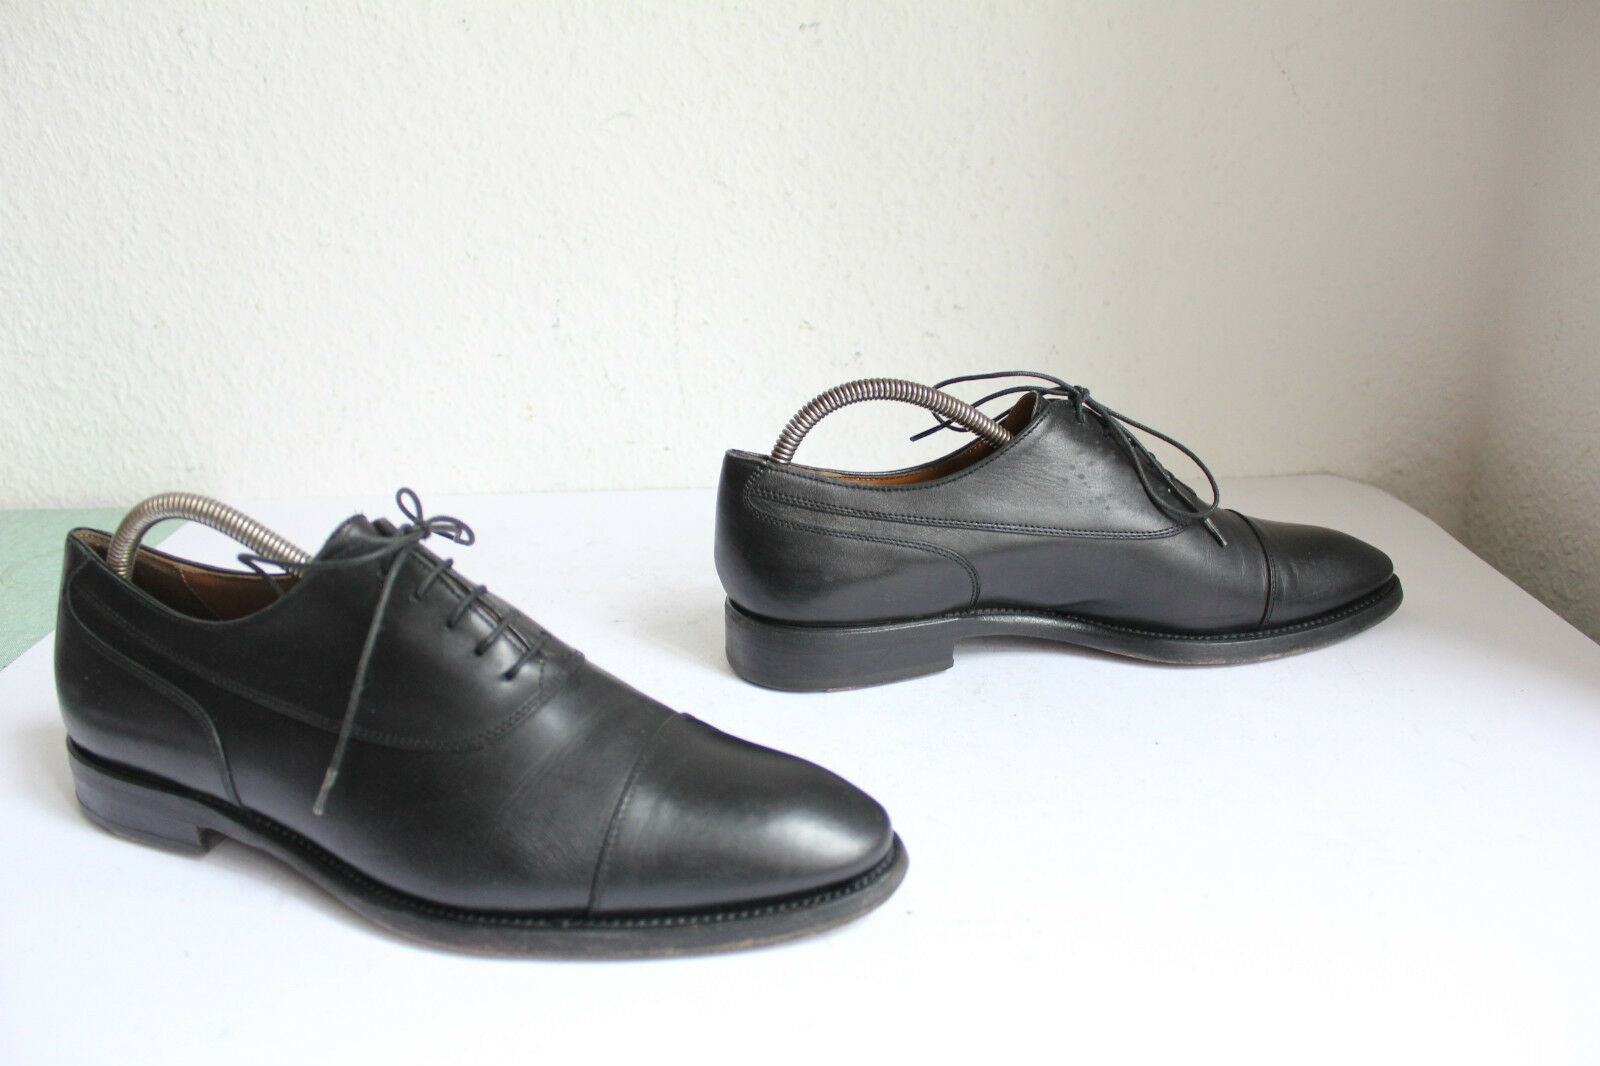 Lendway&Schwarcz Schuhes hand made Luxus Brogue Schuhes Lendway&Schwarcz Voll Echtleder Schwarz Eu:41 64f6b7